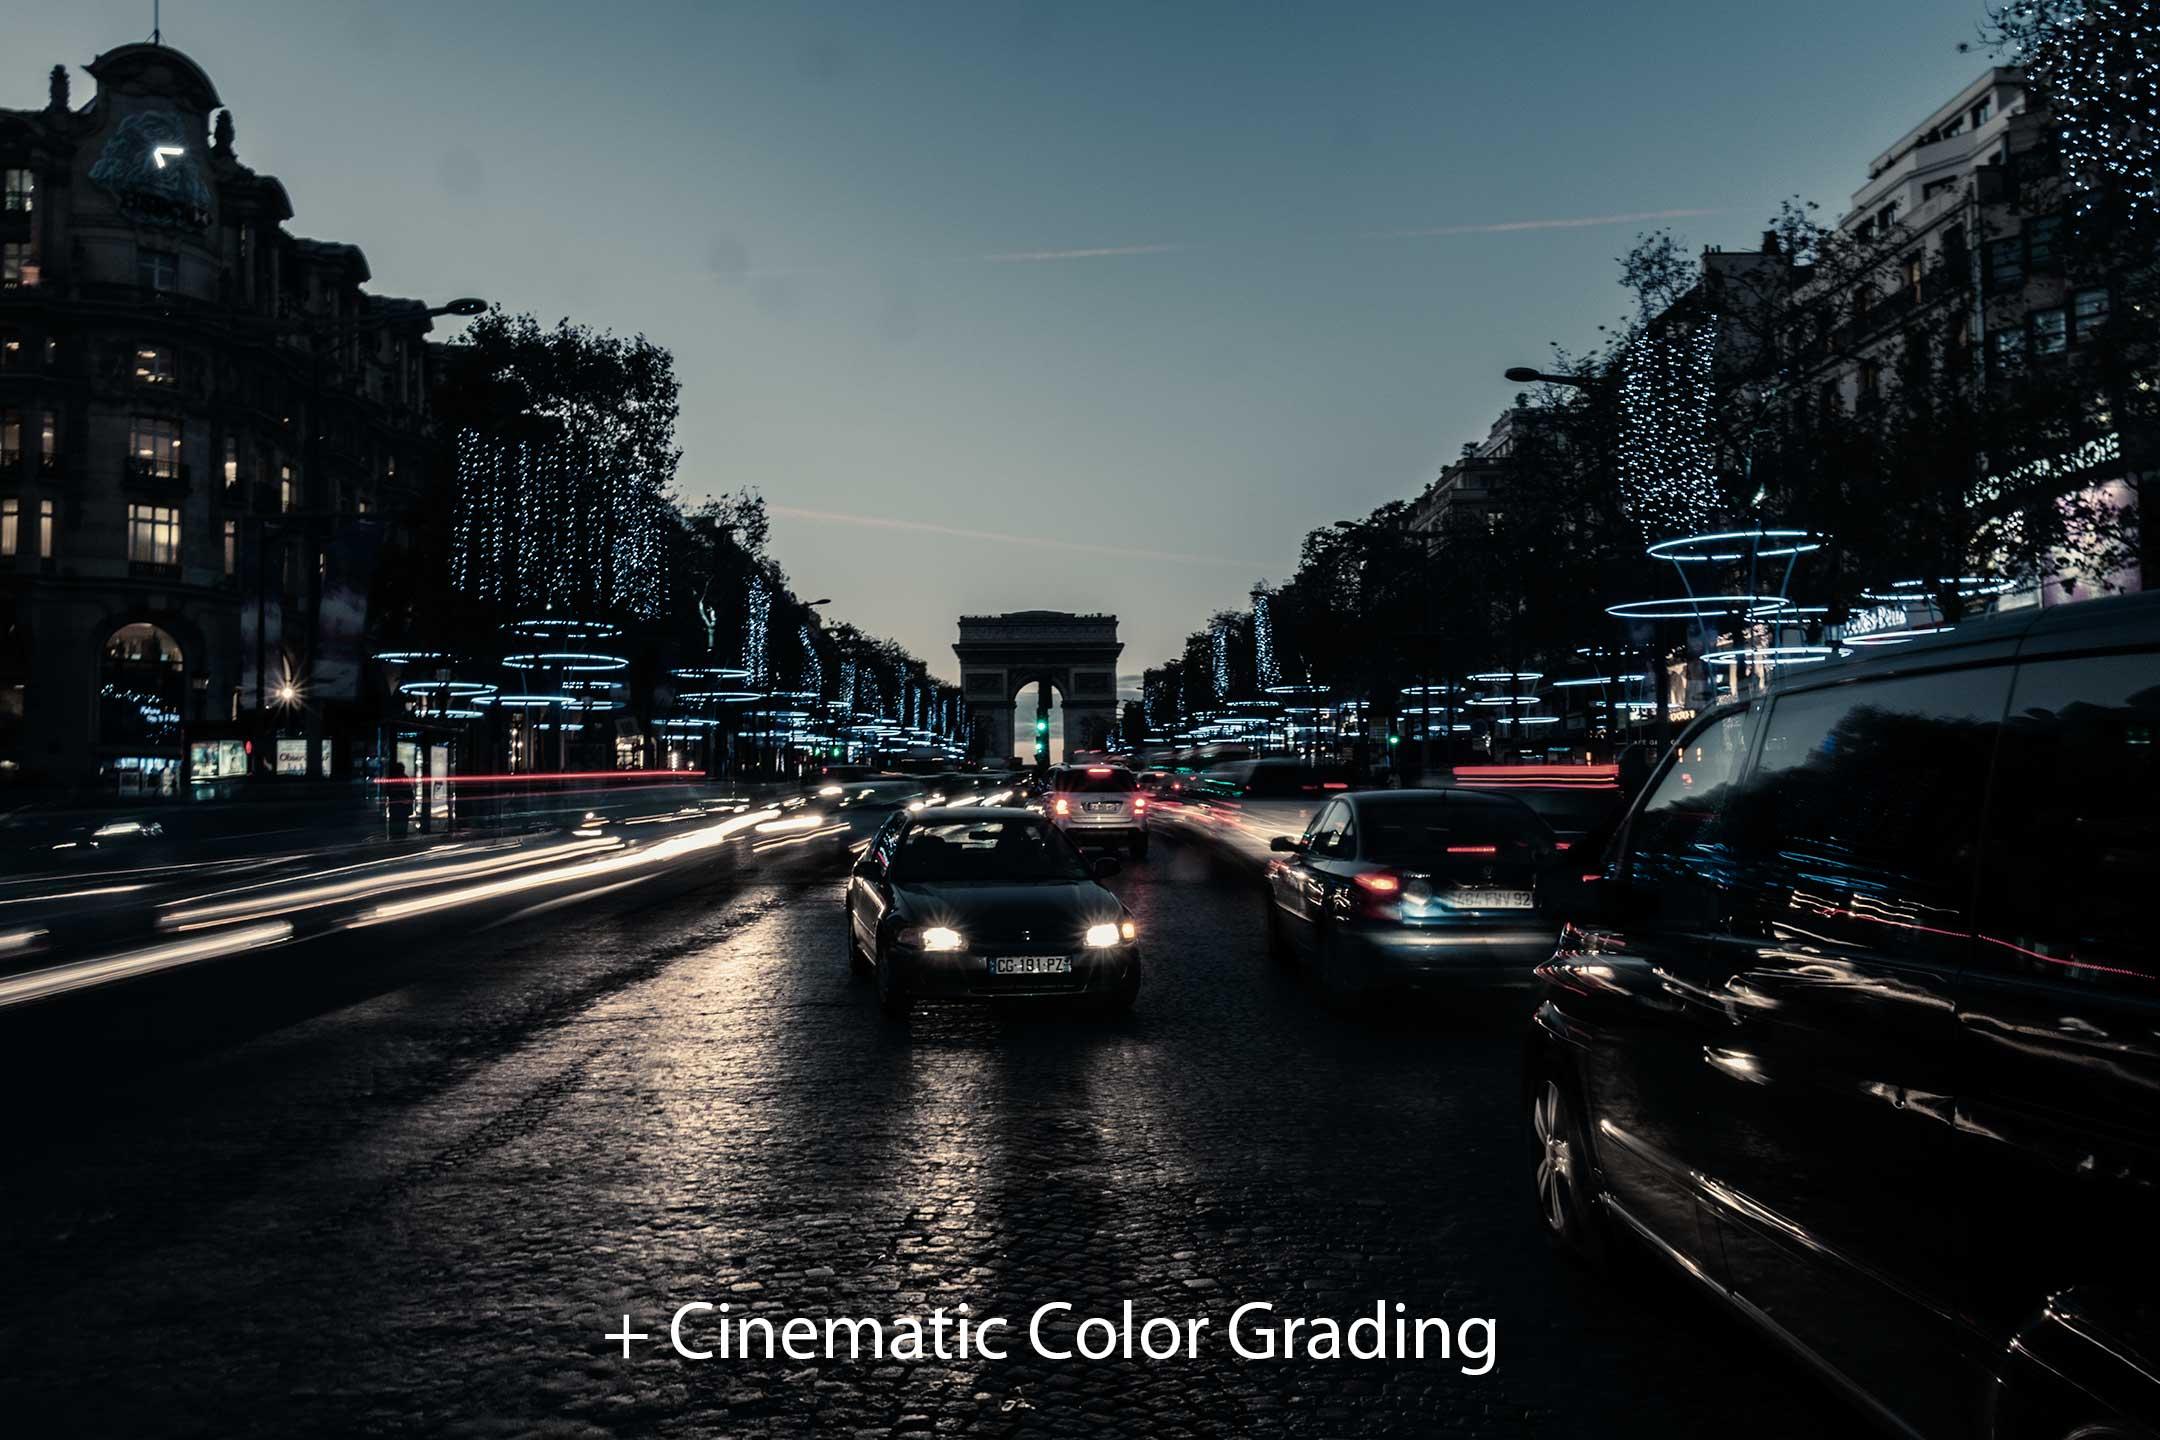 Cinematic Color Grading 1.jpg